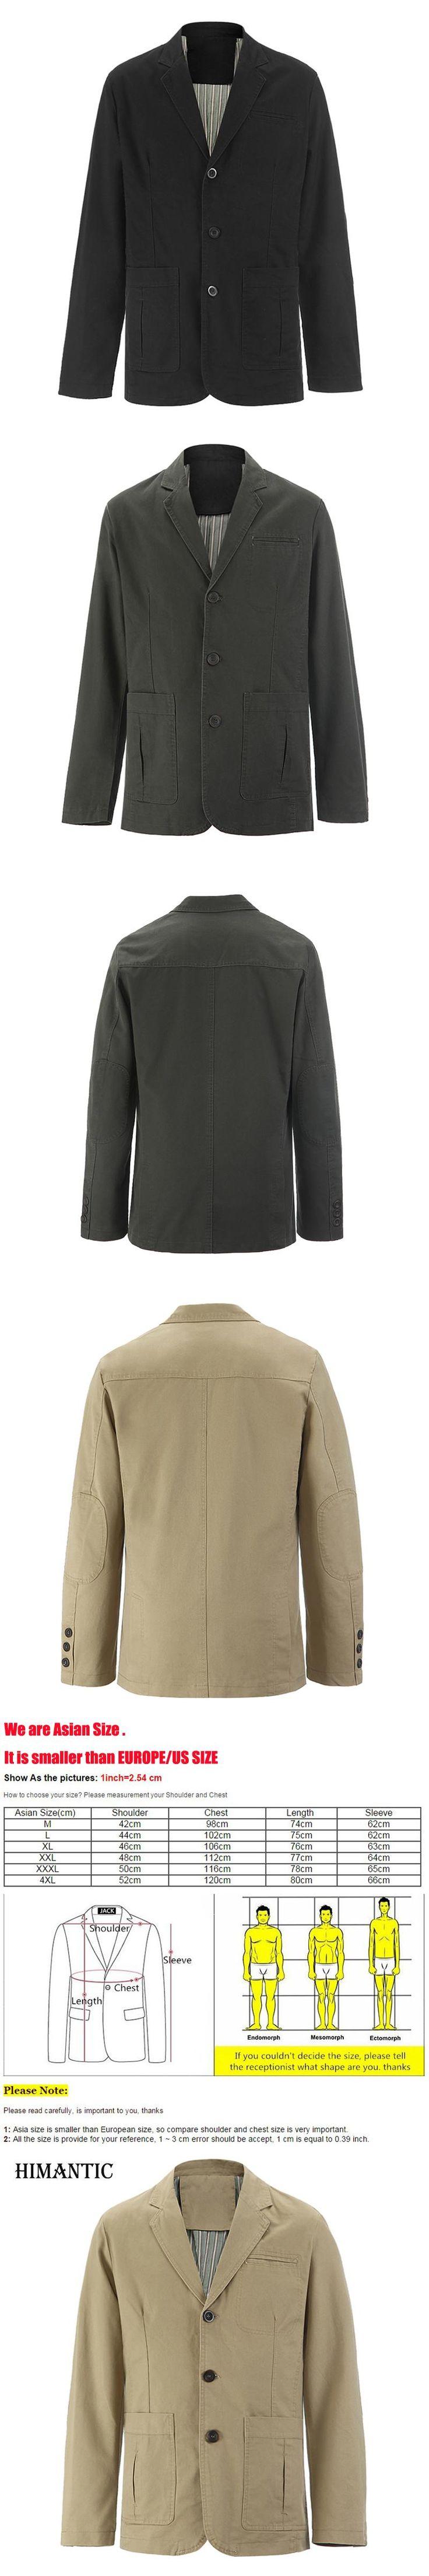 Brand New blazer men Casual Blazer Cotton Denim Parka Men's slim fit Jackets Army Green Khaki Large Size M - XXXL 4XL Coat